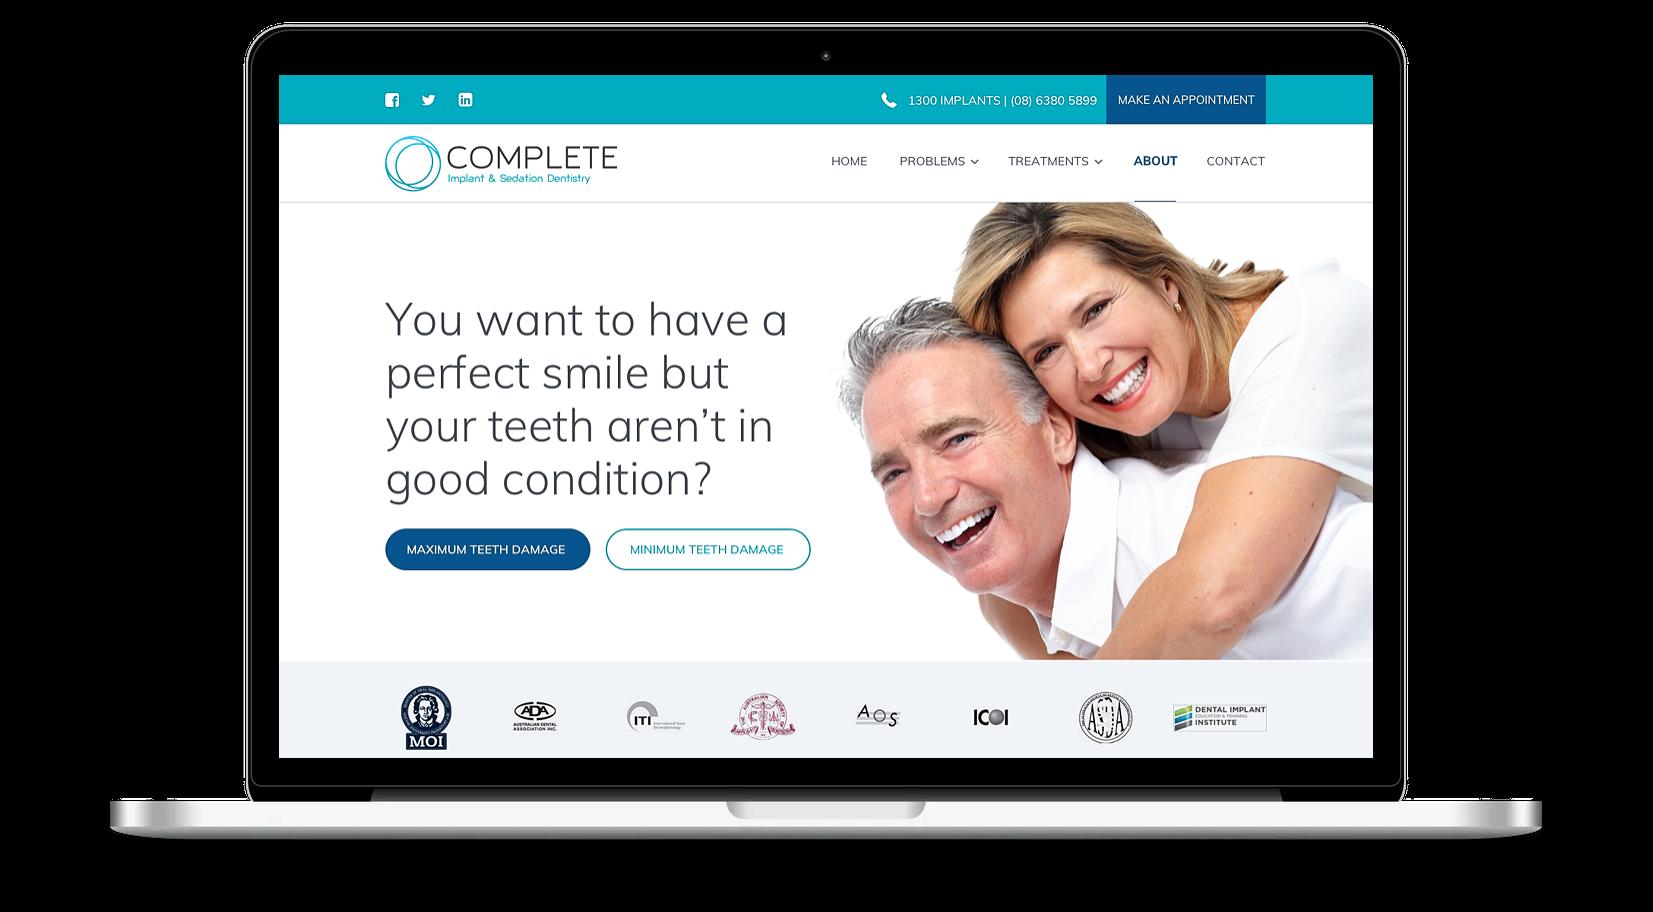 Dentistry website design template in Sydney